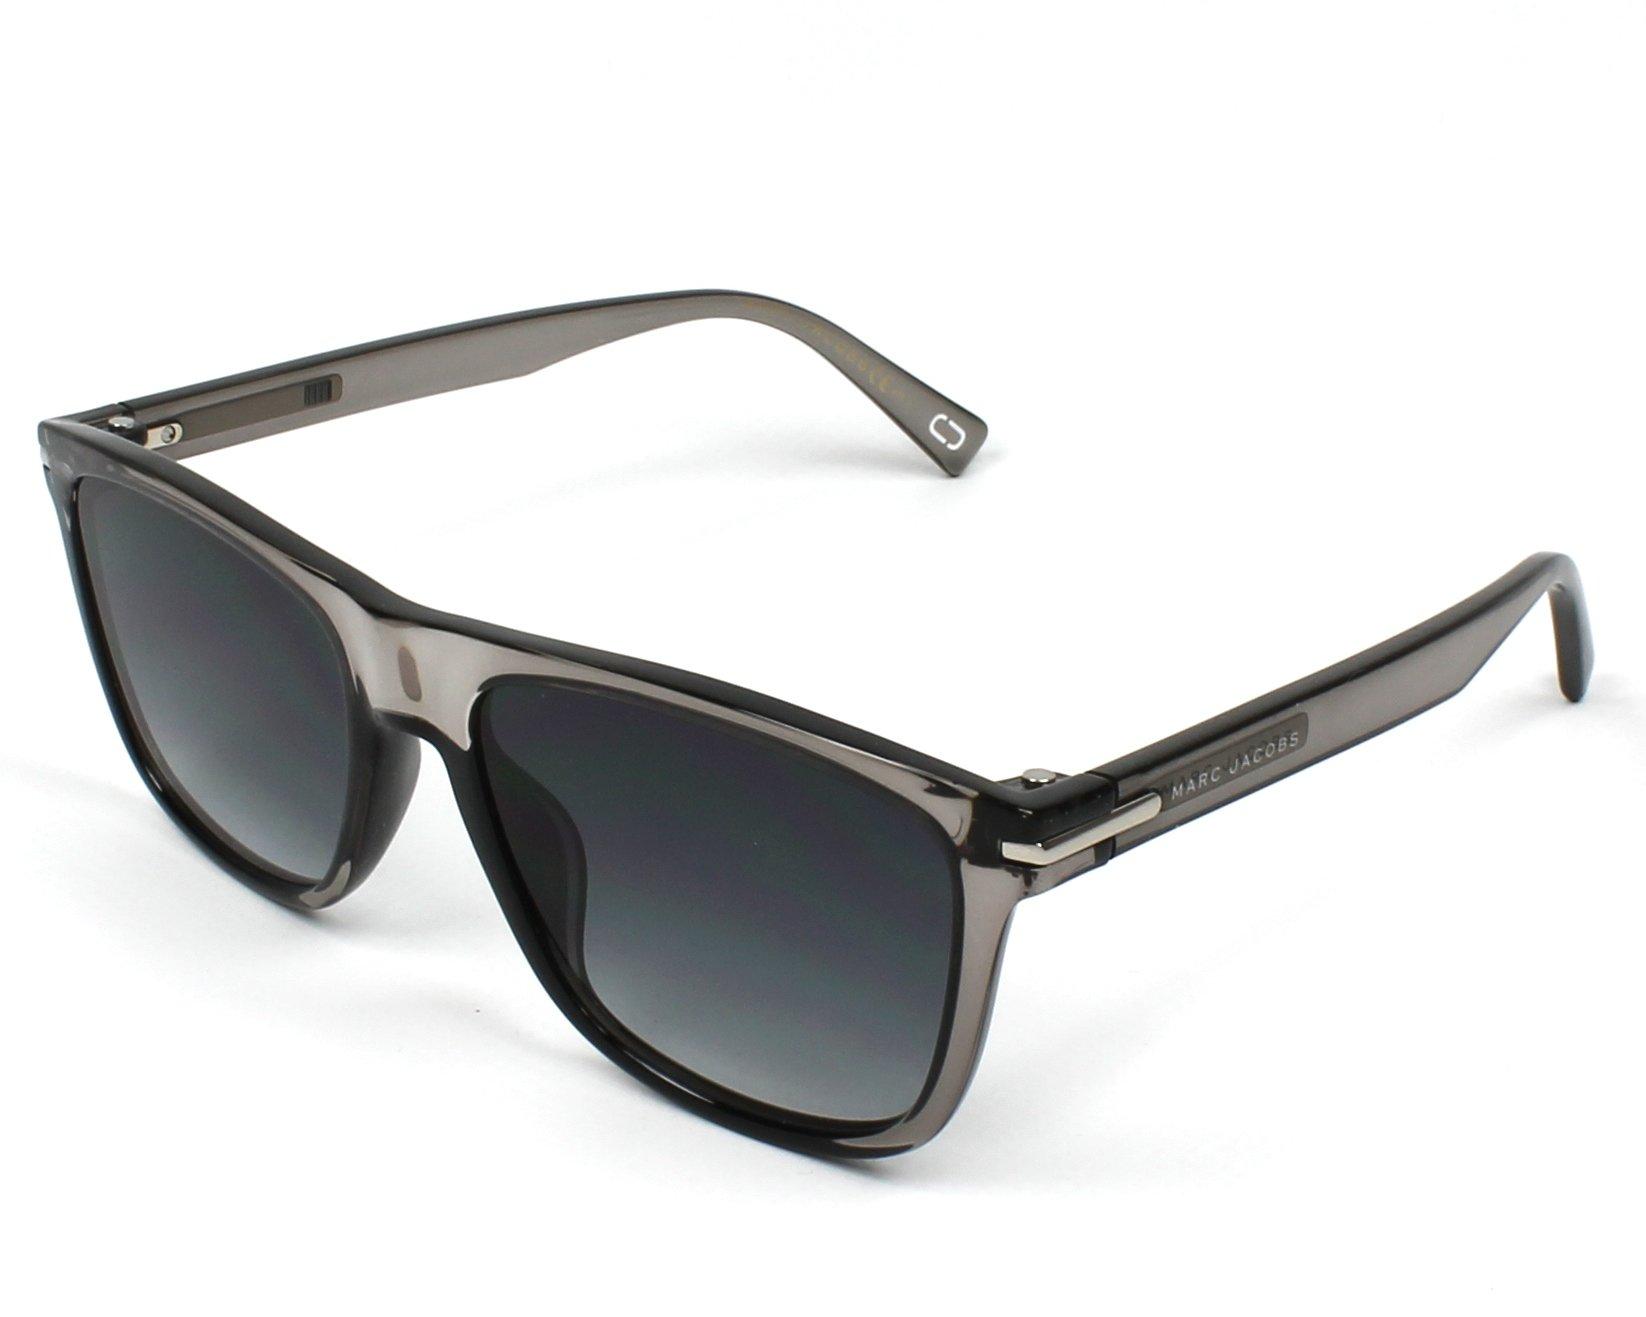 Sunglasses Marc Jacobs MARC-221-S R6S 9O 55-18 Grey profile 01401d7a0677